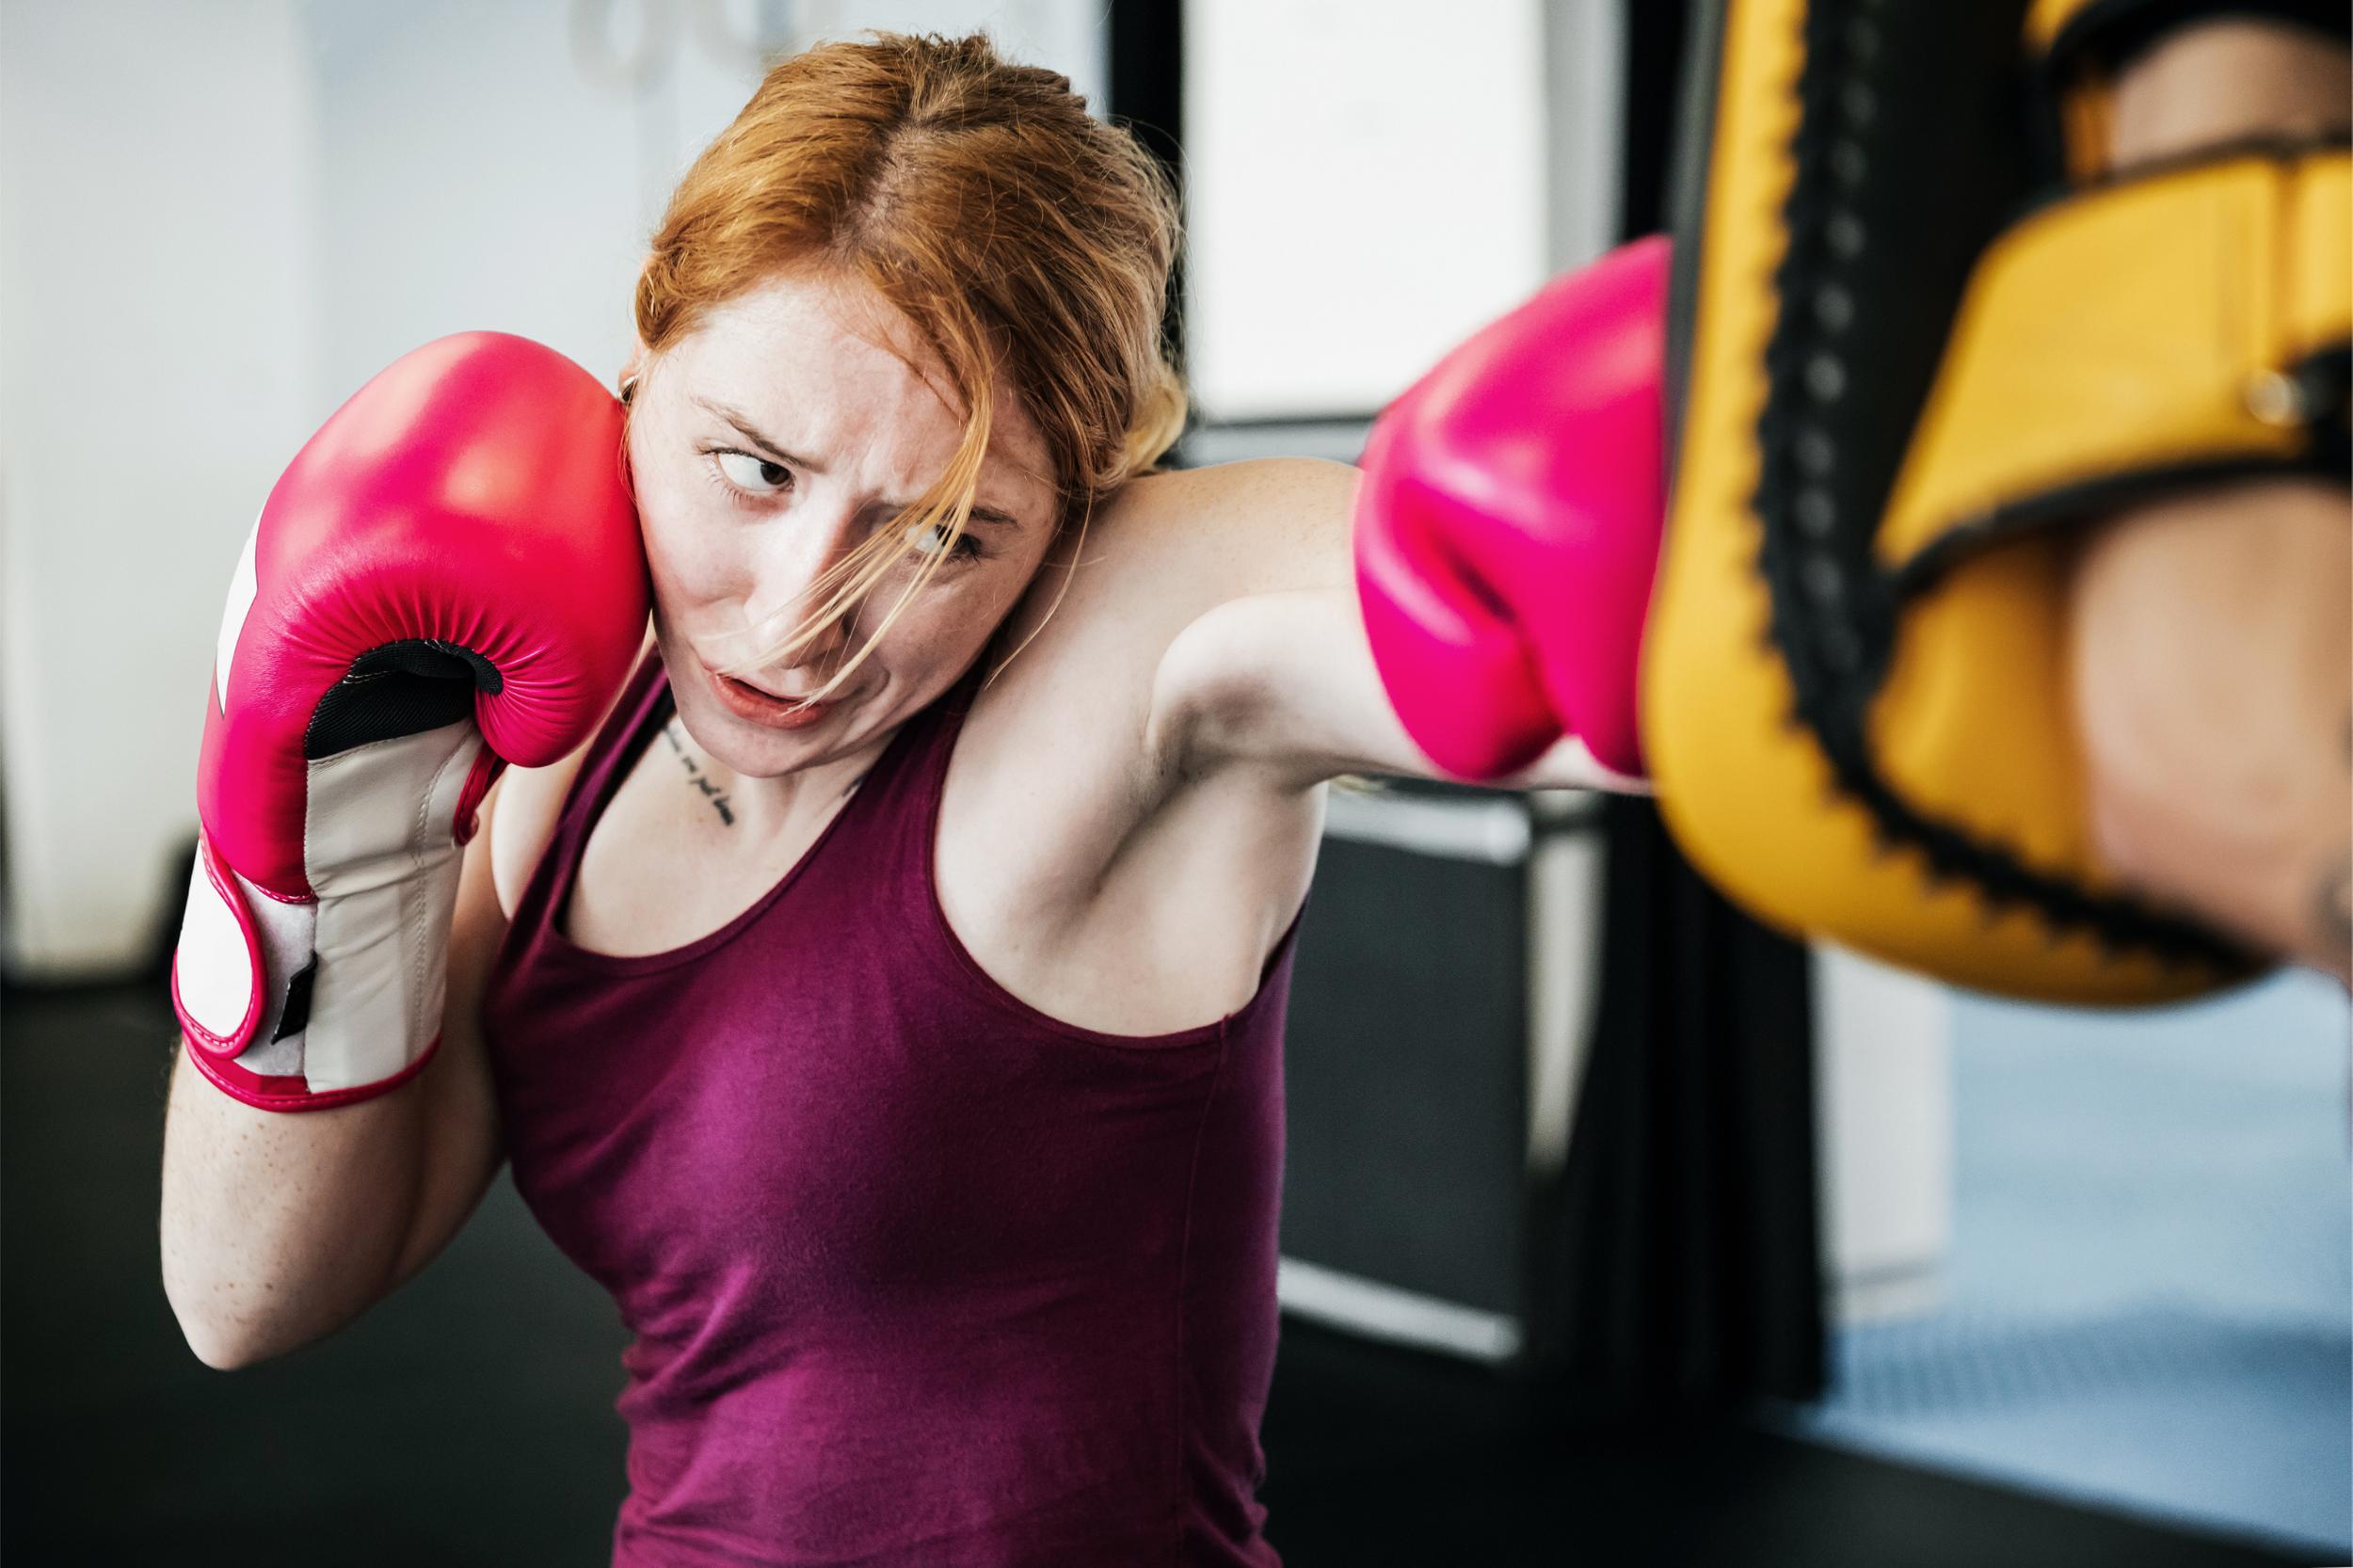 Hands Down Martial Arts Academy in Cobham and Epsom, Surrey UK